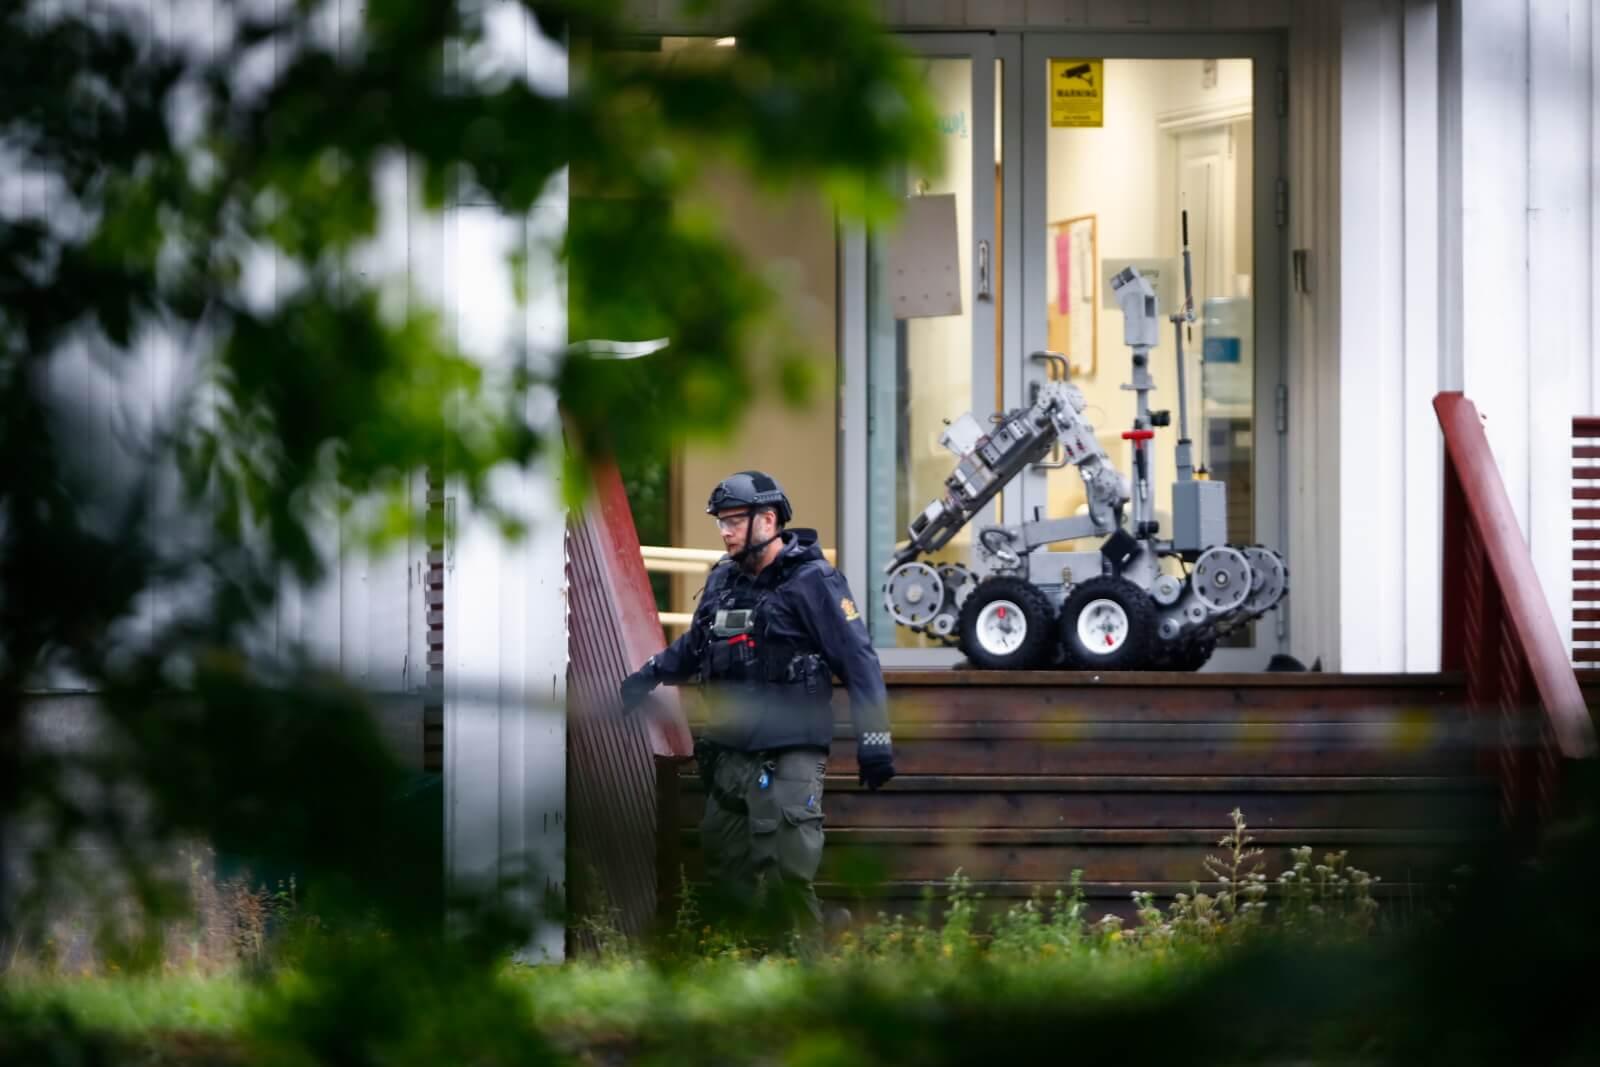 Strzelanina w norweskim meczecie fot. EPA/TERJE PEDERSEN